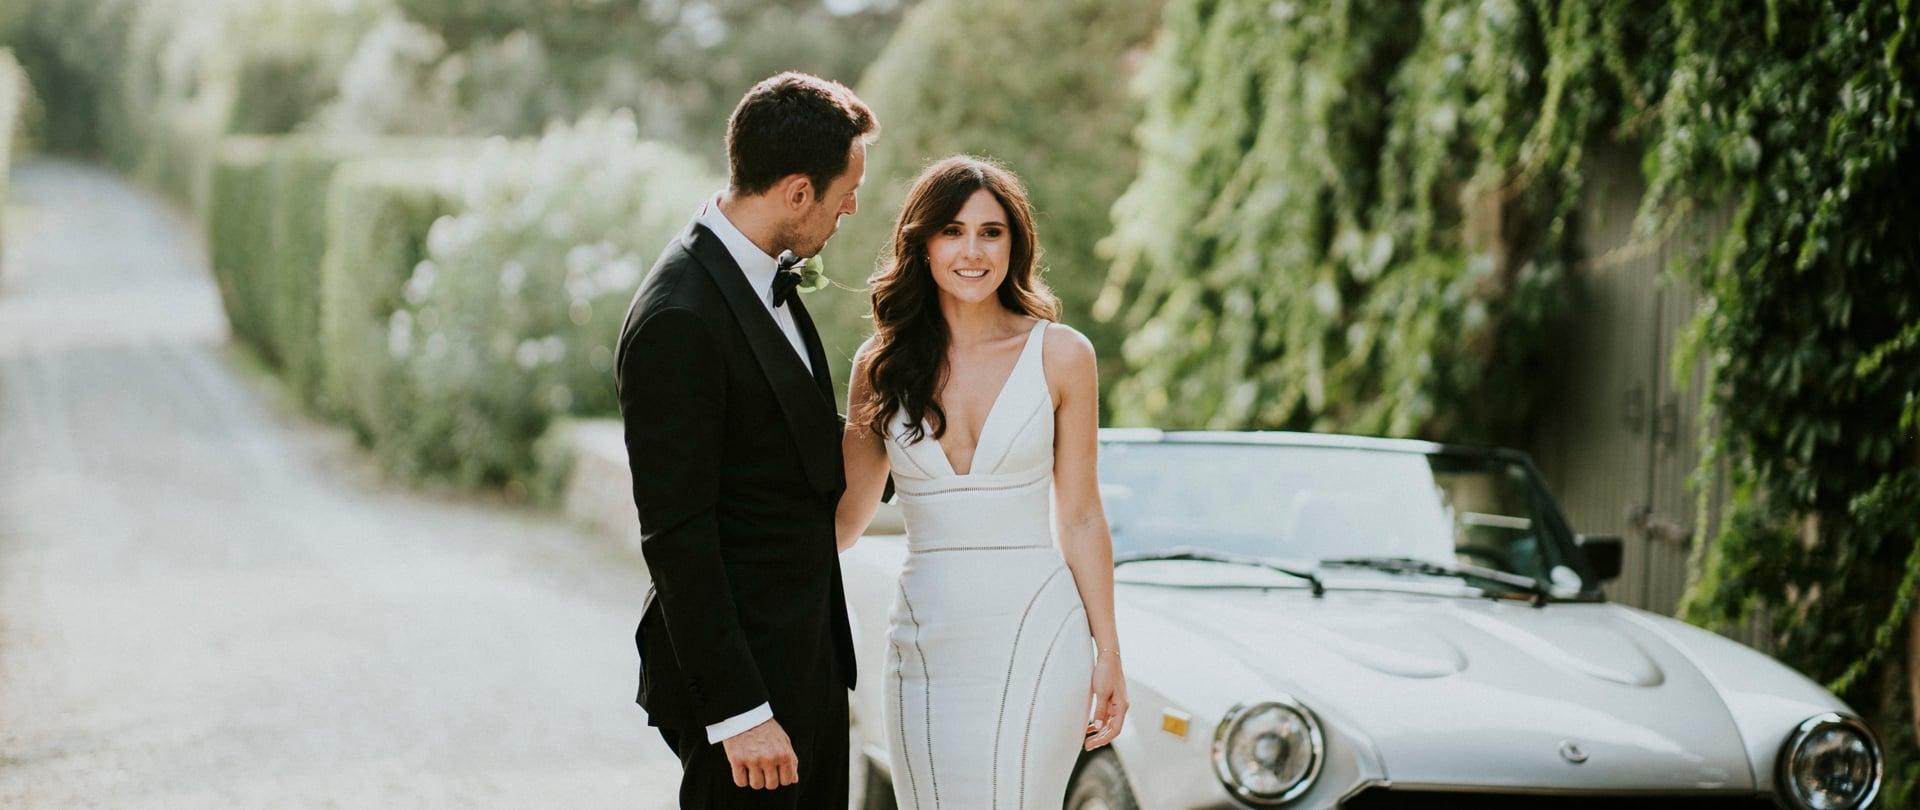 Jessica & Andrew Wedding Video Filmed at Tuscany, Italy